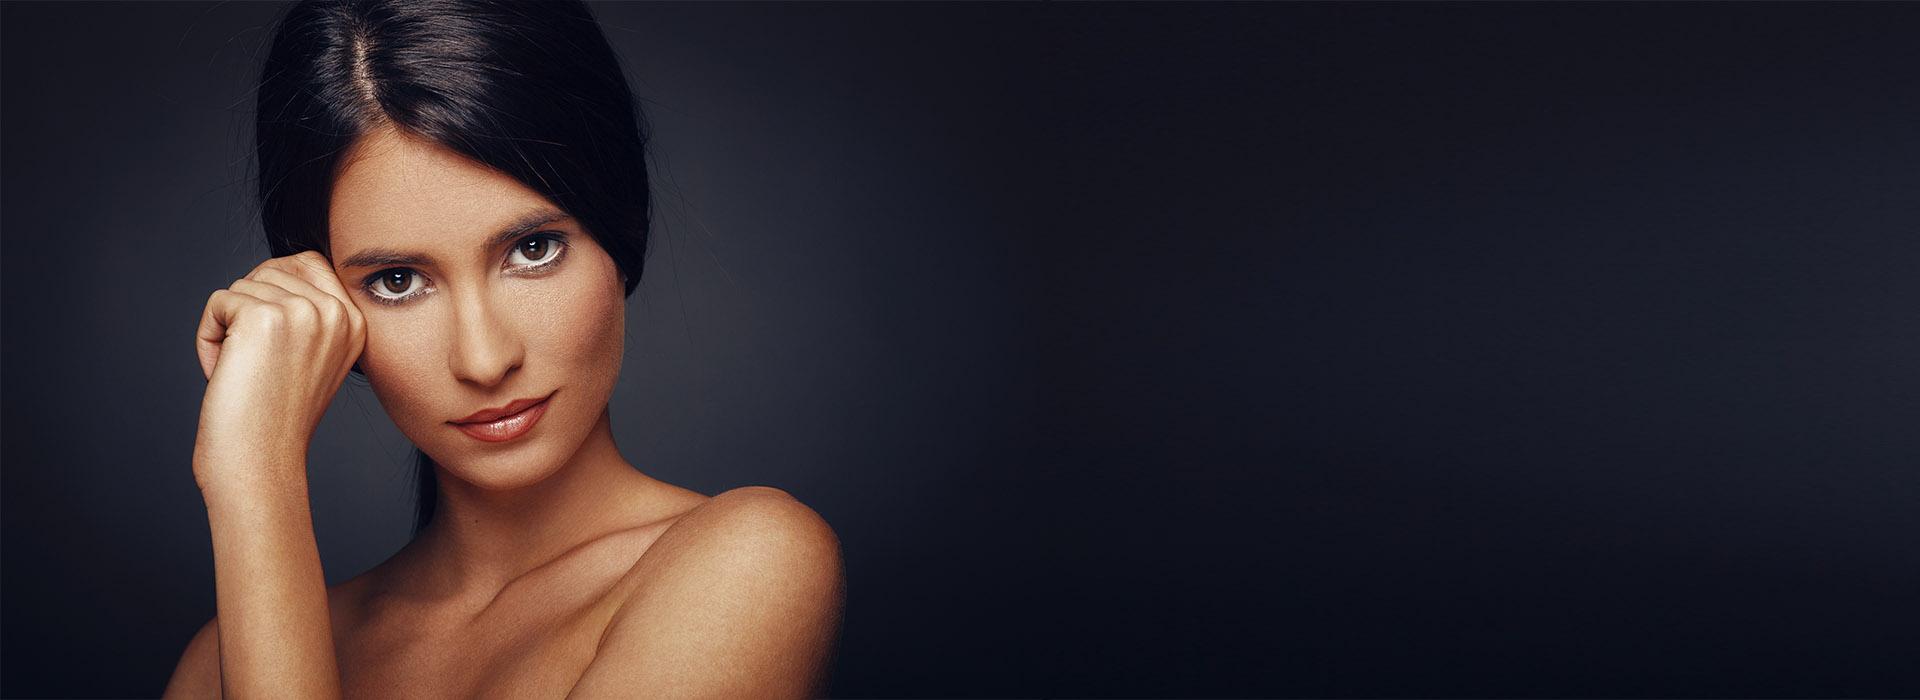 facial aesthetics treatment clinic